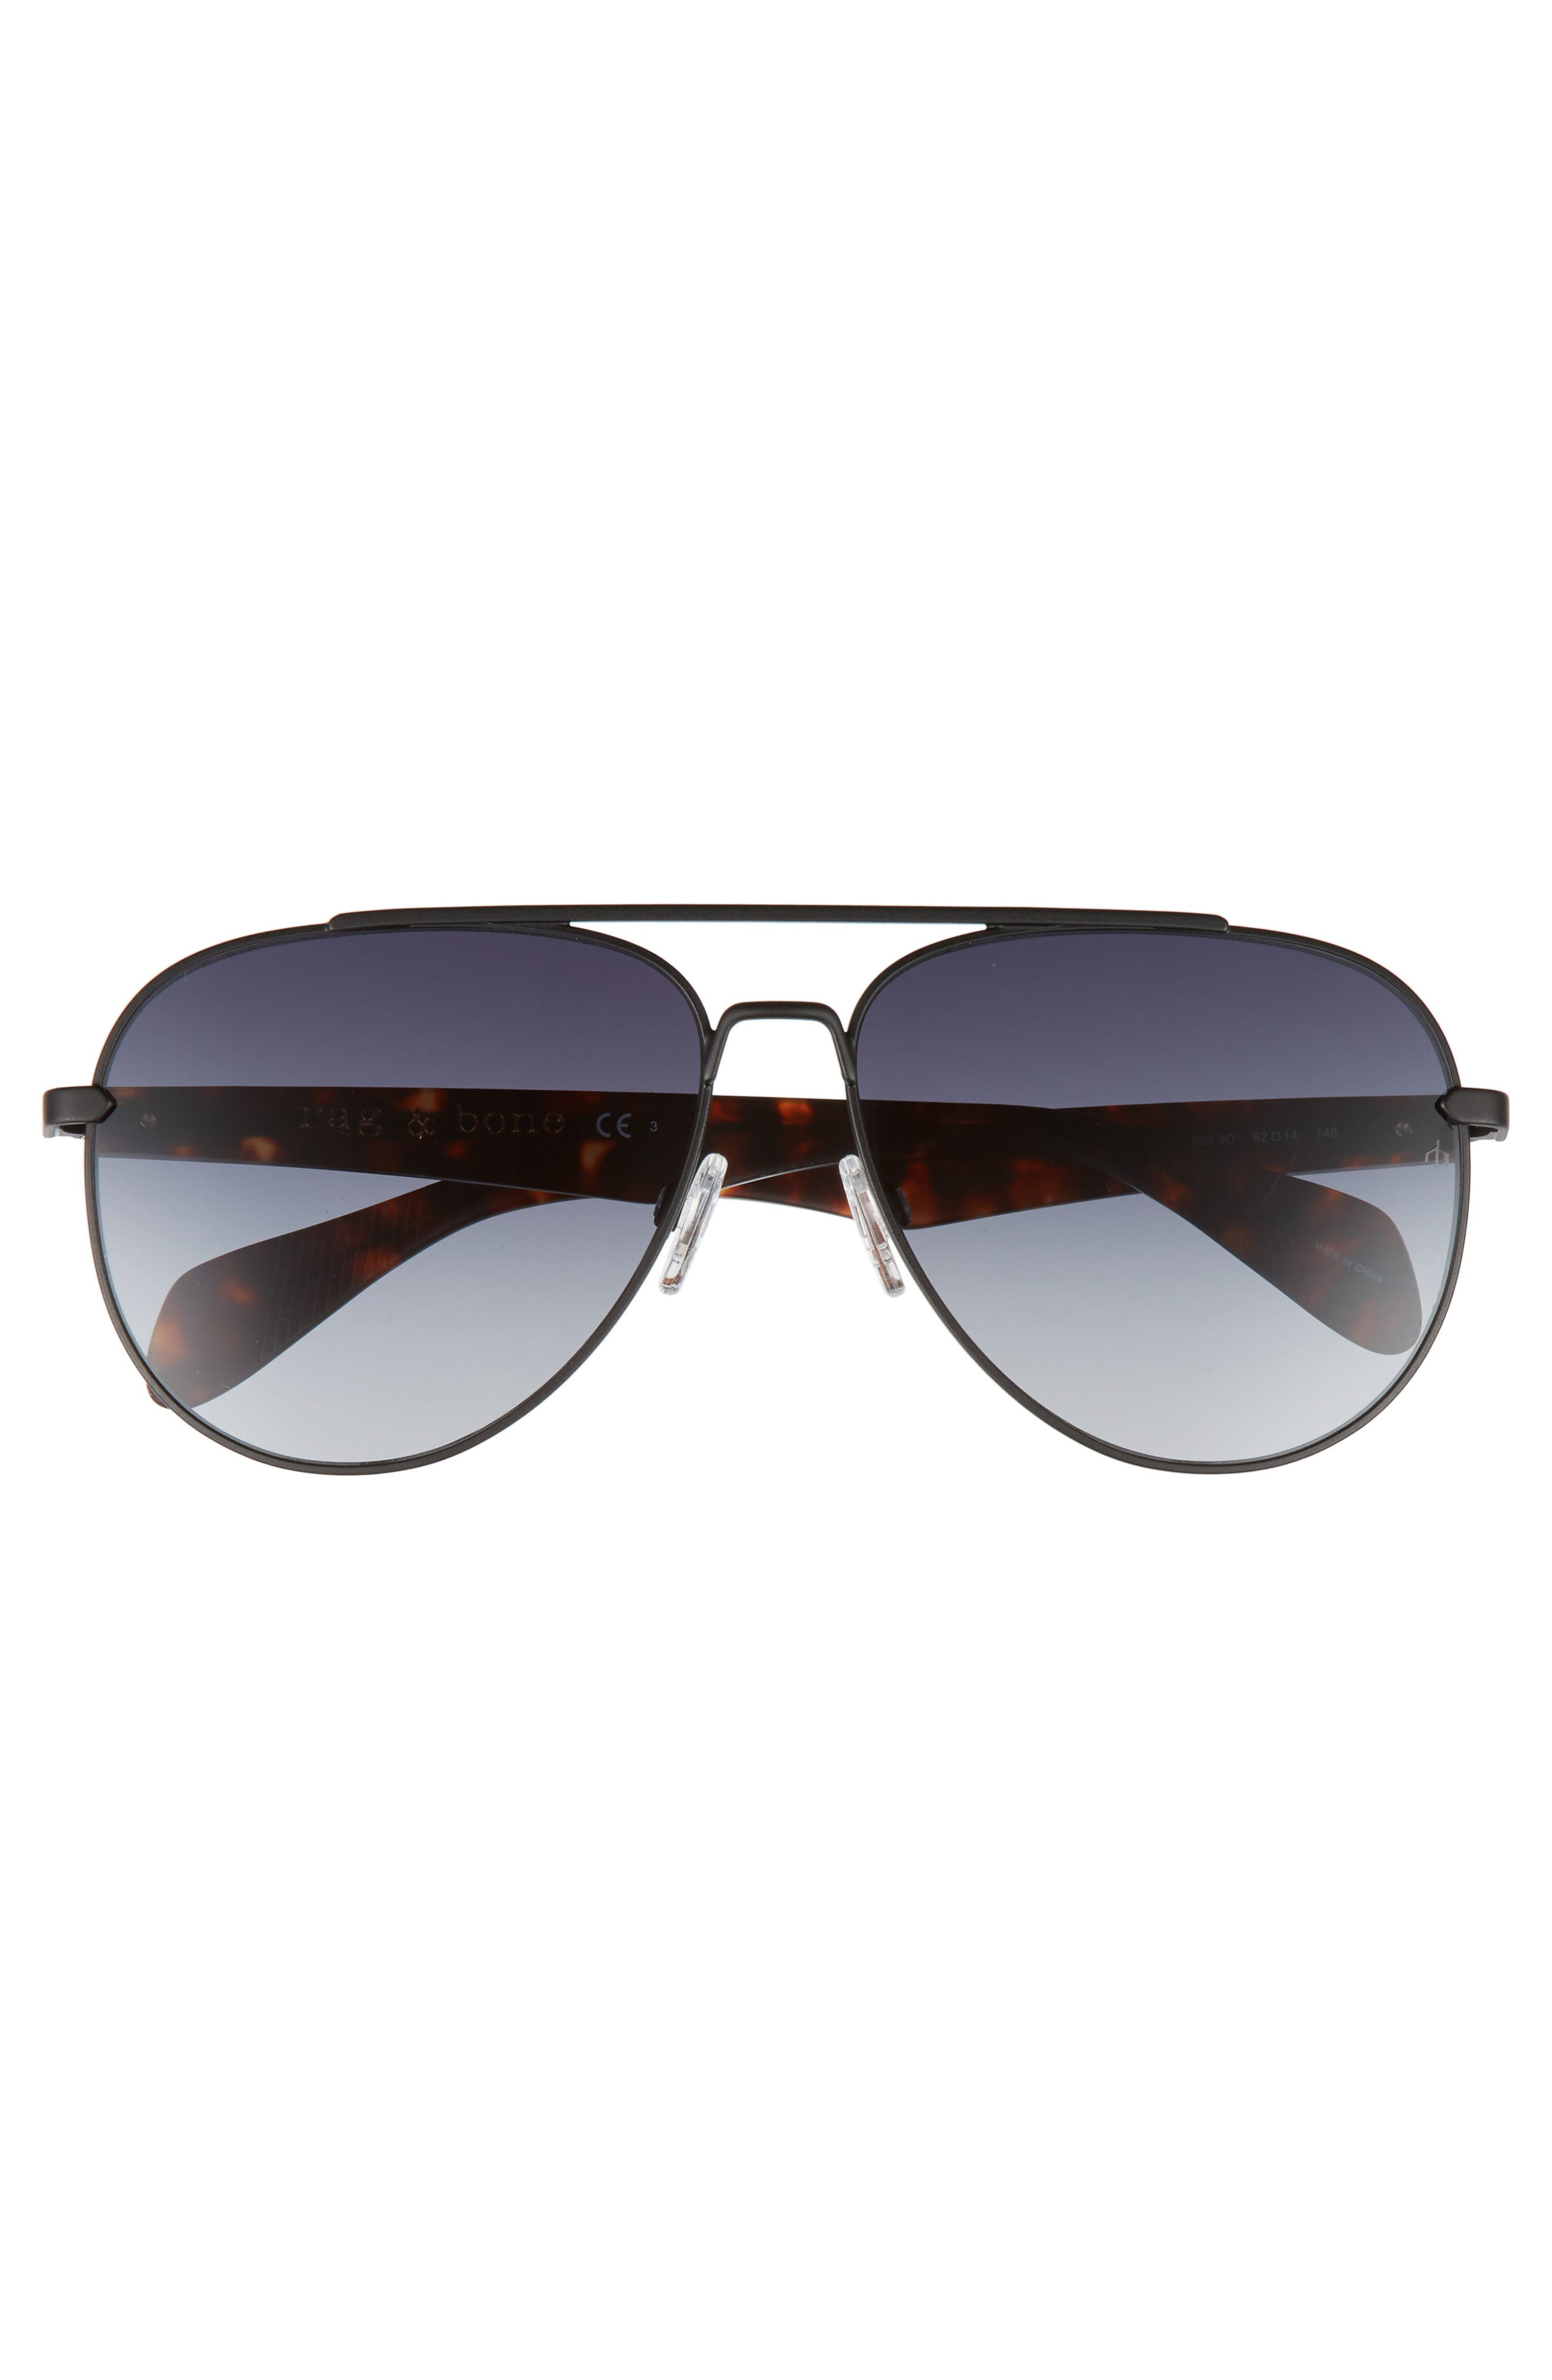 62mm Aviator Sunglasses,                             Alternate thumbnail 2, color,                             Matte Black